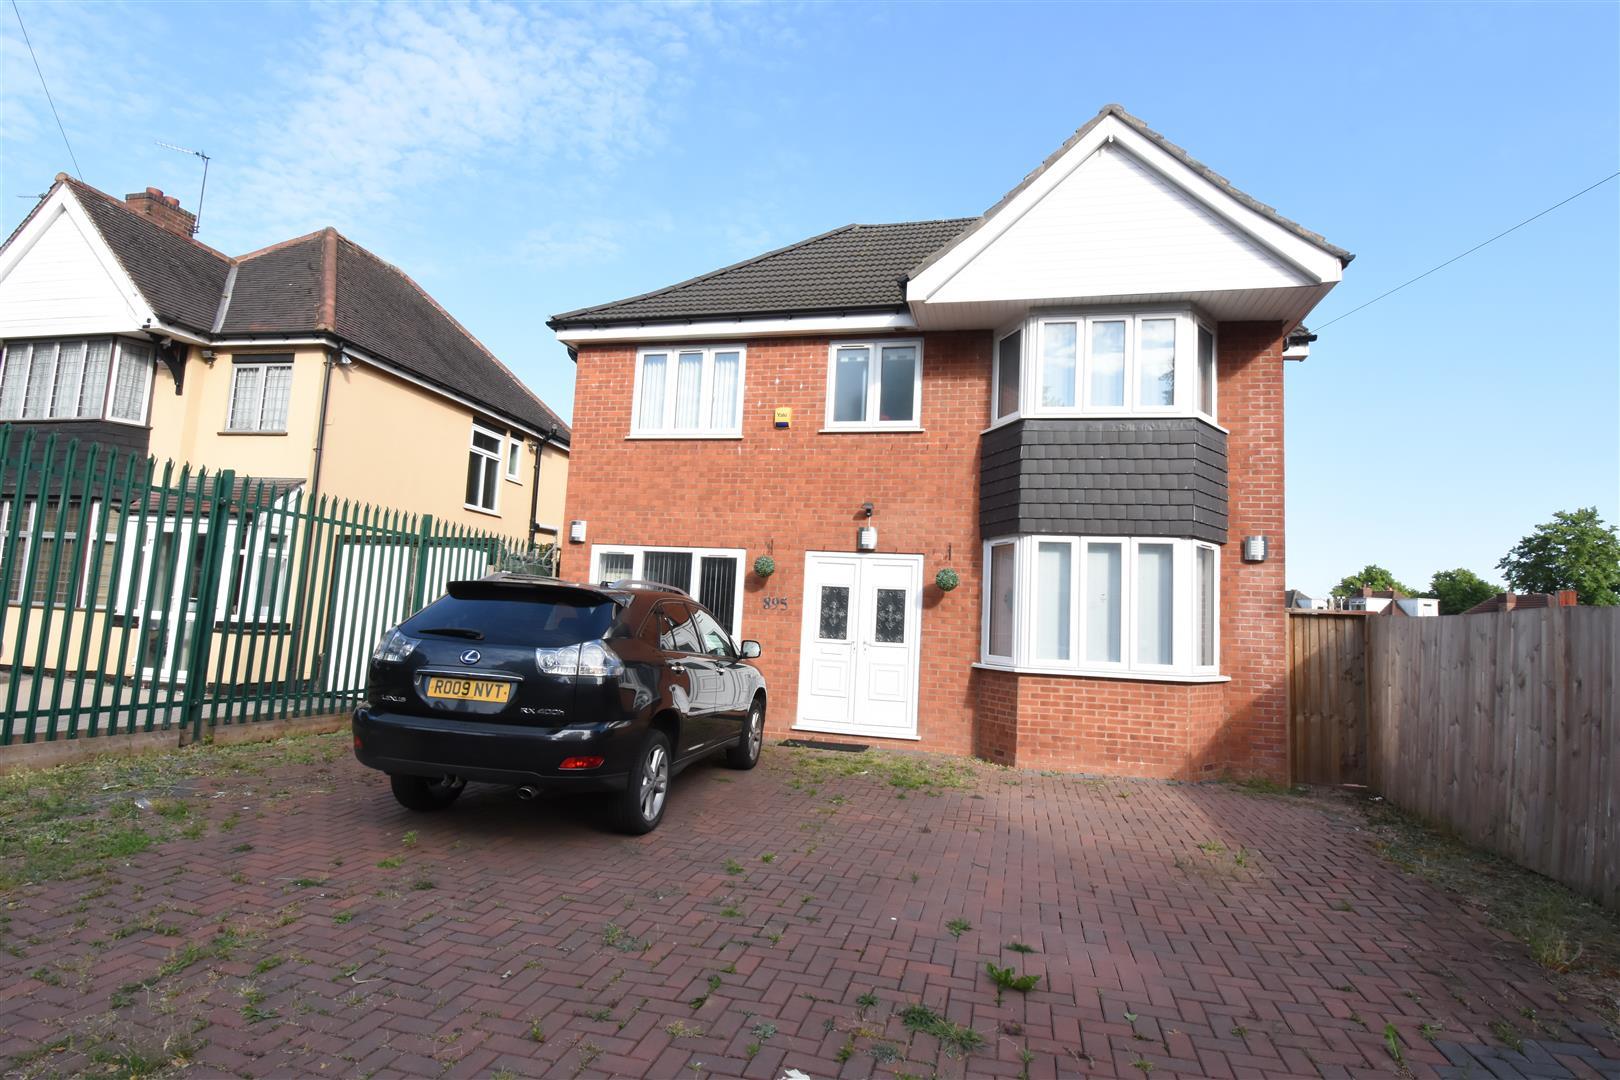 4 bed house for sale in Alum Rock Road, Ward End, Birmingham, B8